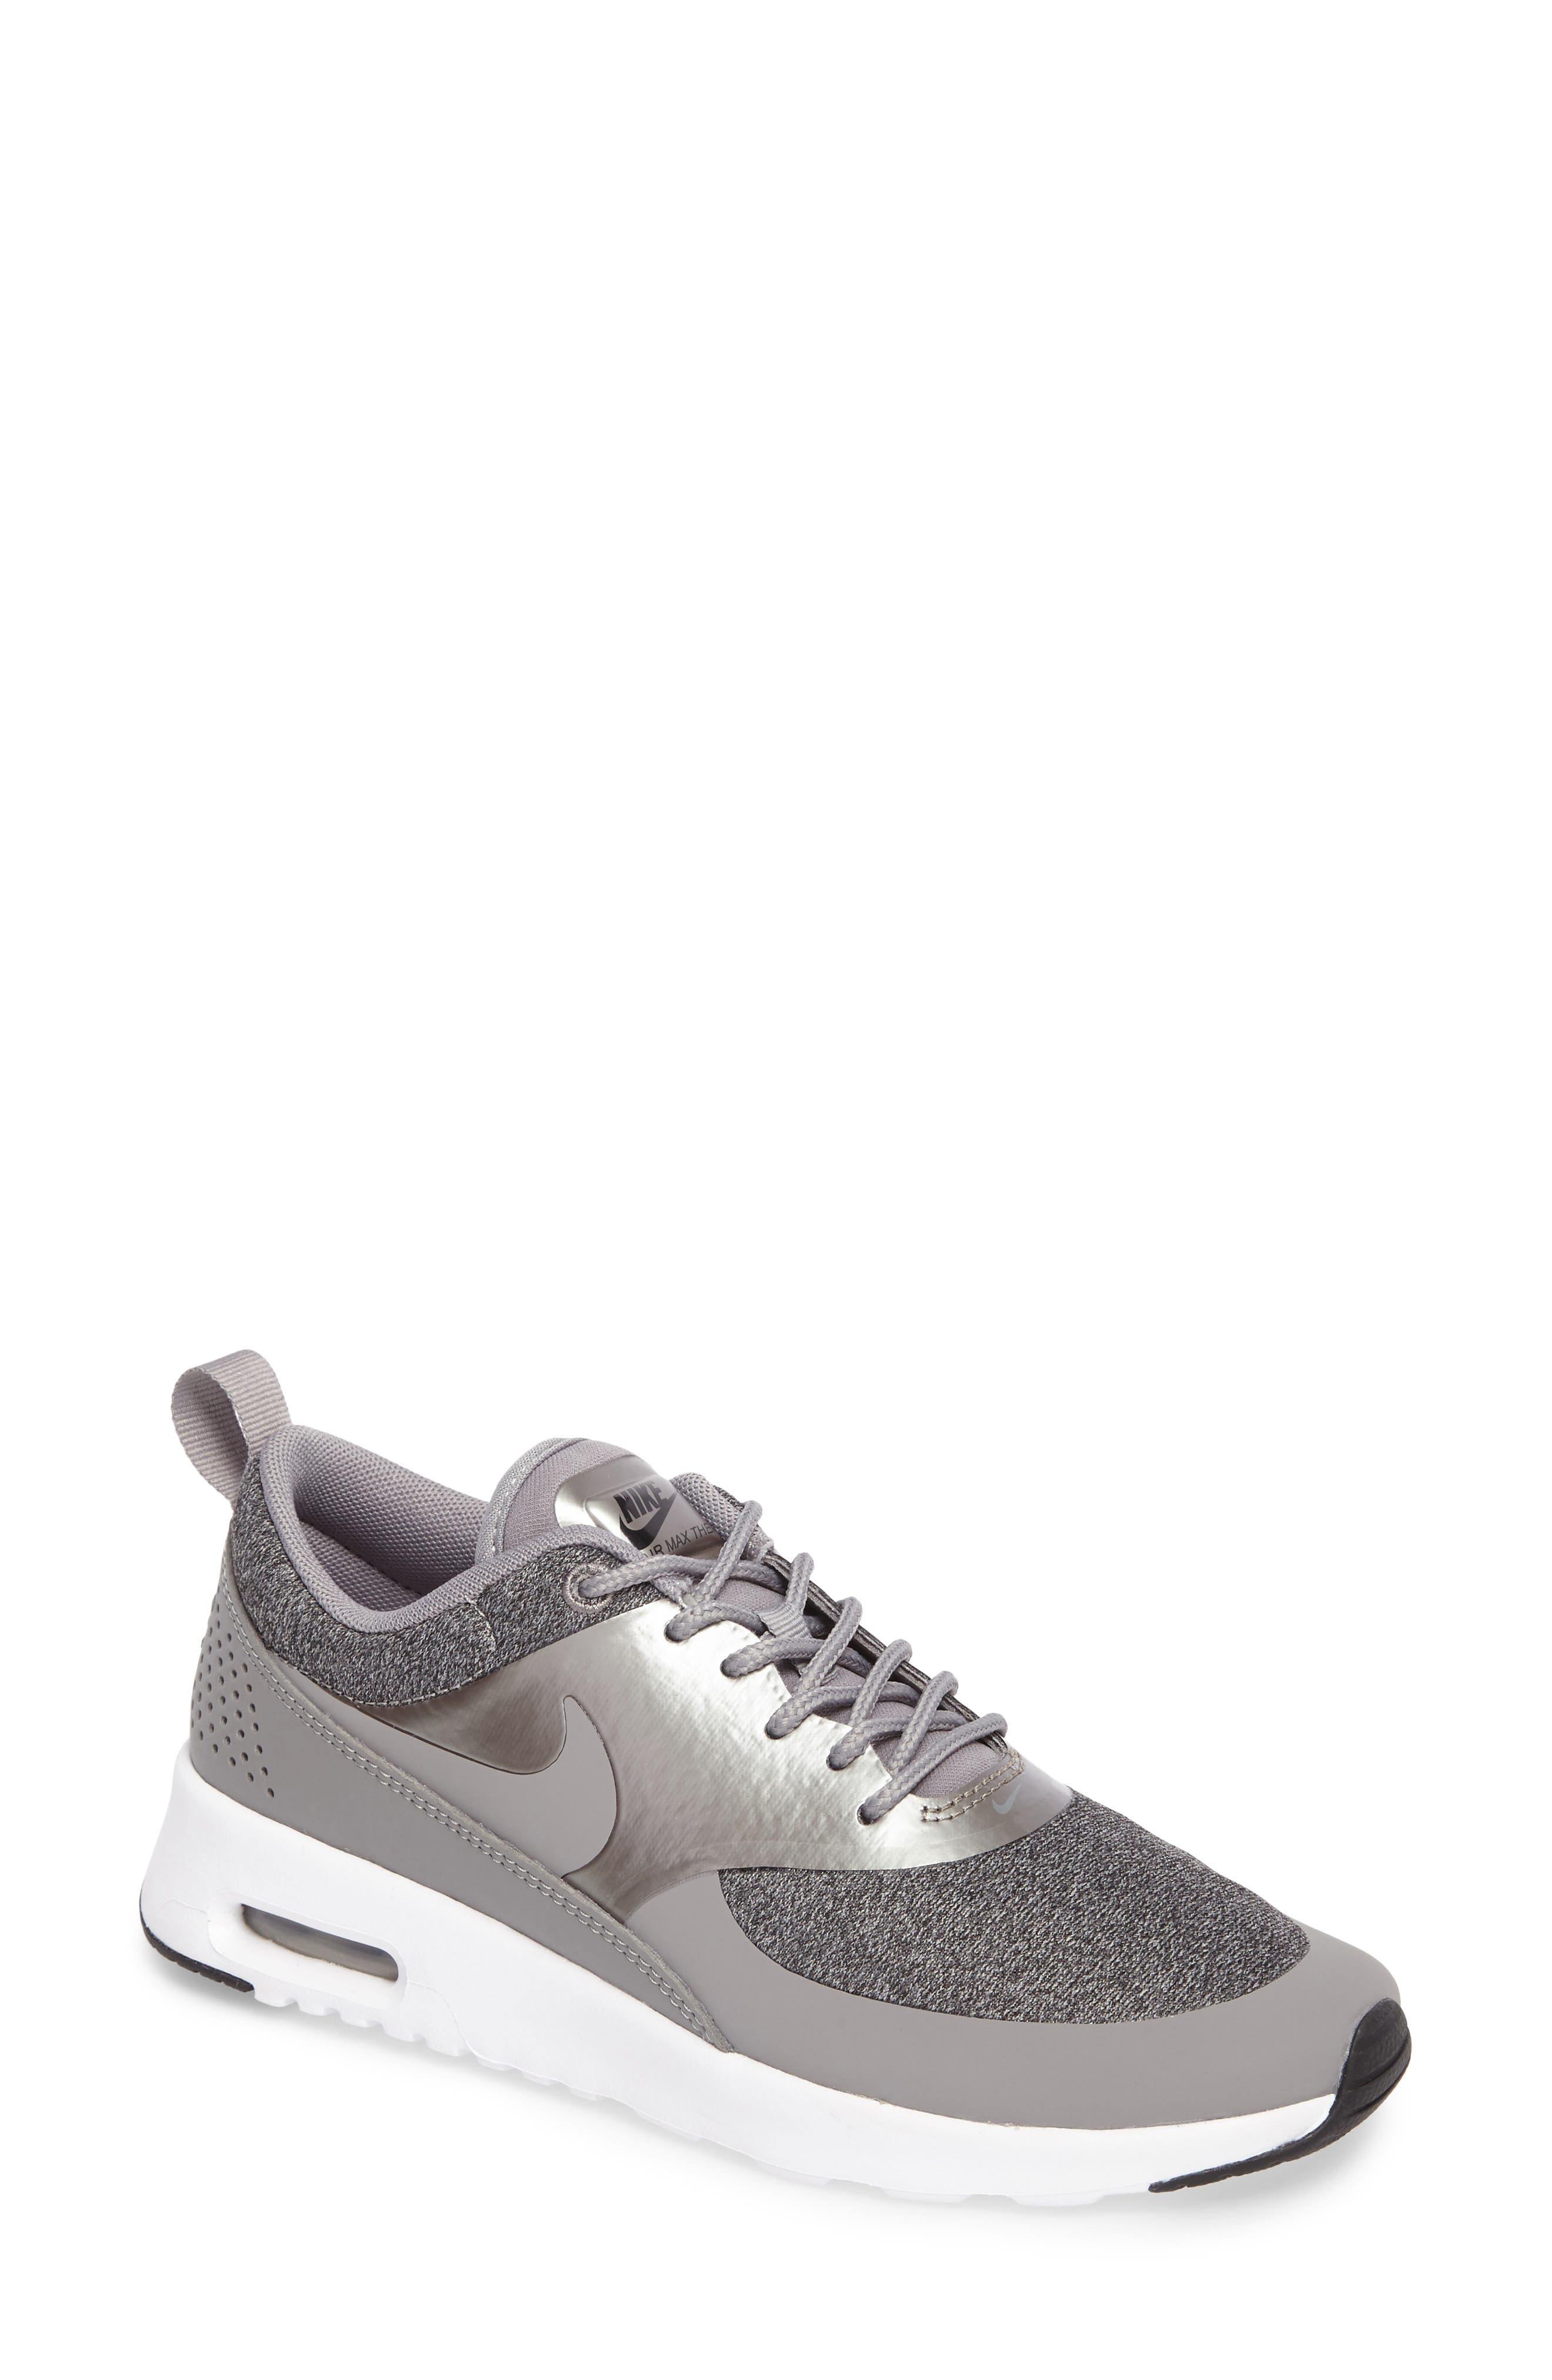 Nike Air Max Thea Knit Sneaker (Women)